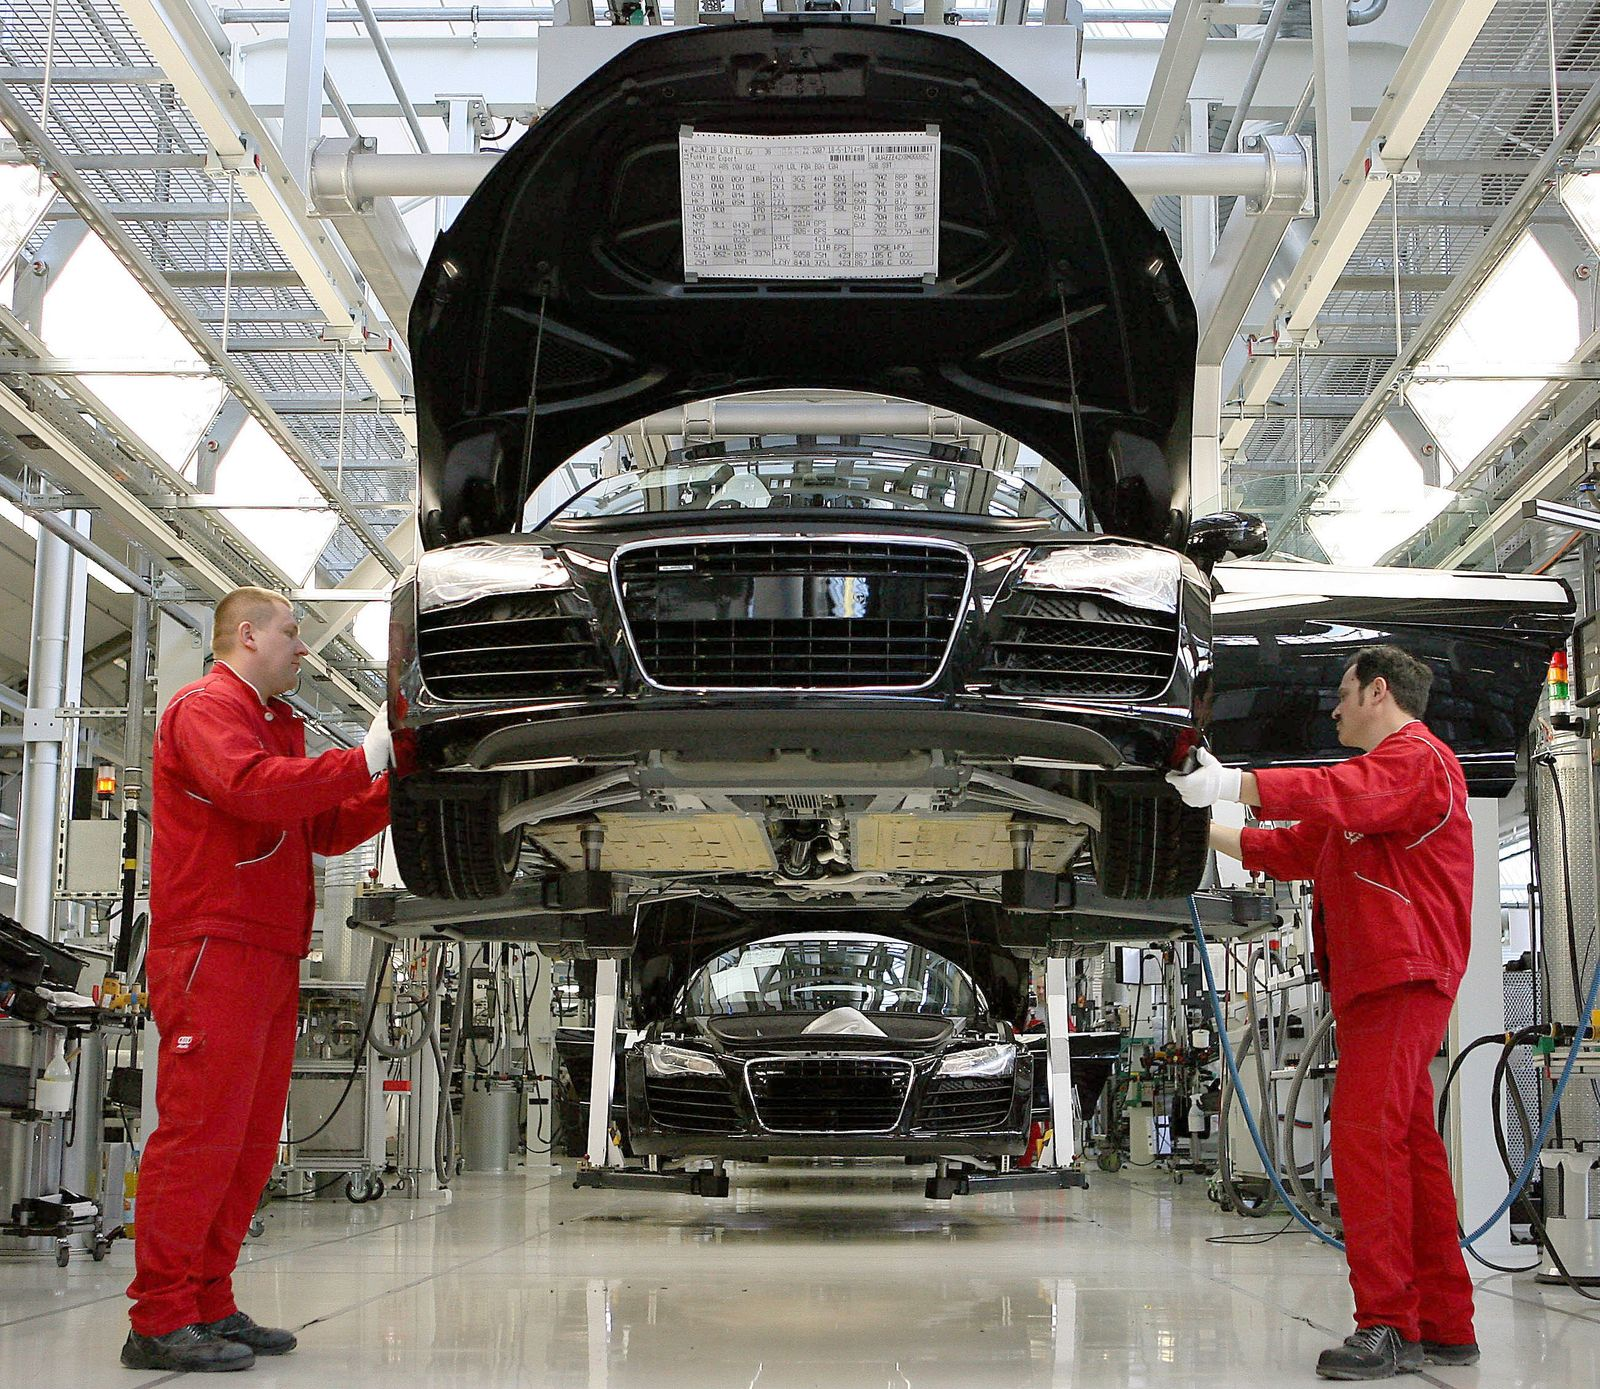 Regierung bereitet Konjunktur-Paket vor - Automobilbau